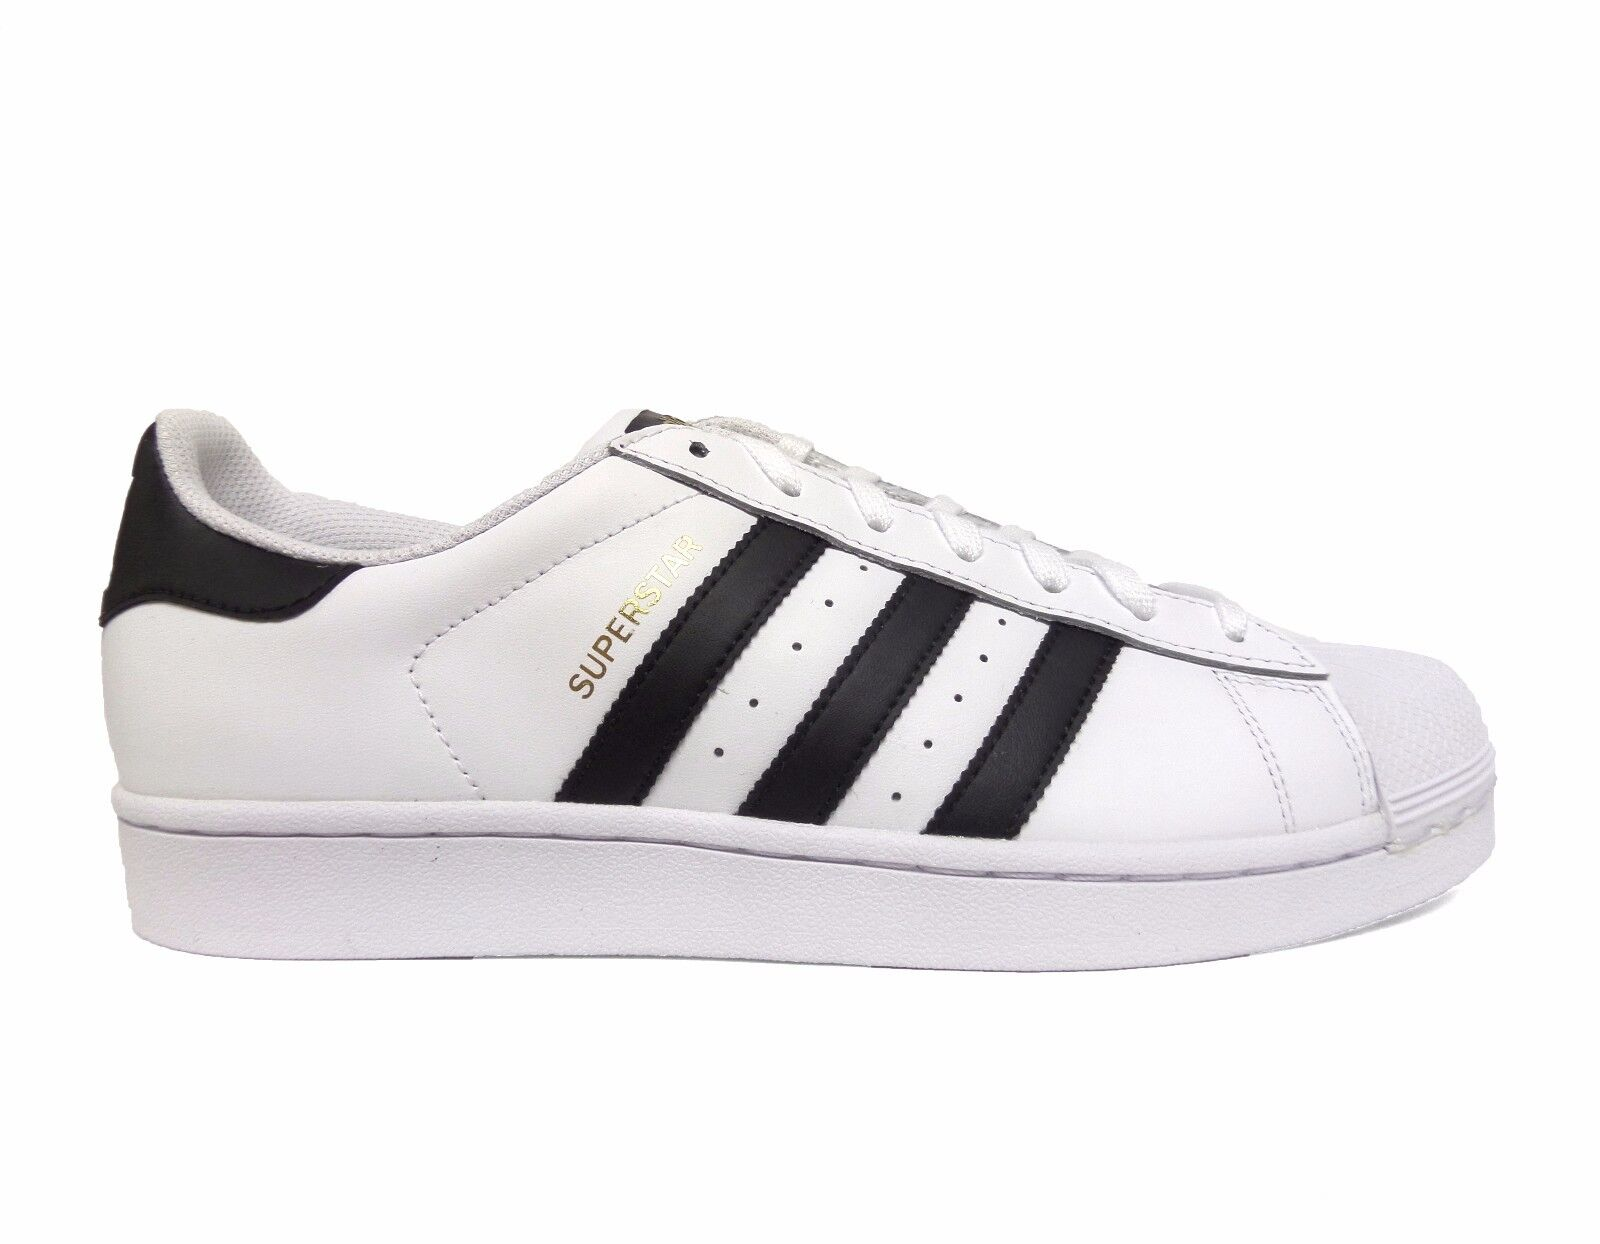 Adidas Men's Originals SUPERSTAR Casual shoes White Black C77124 b